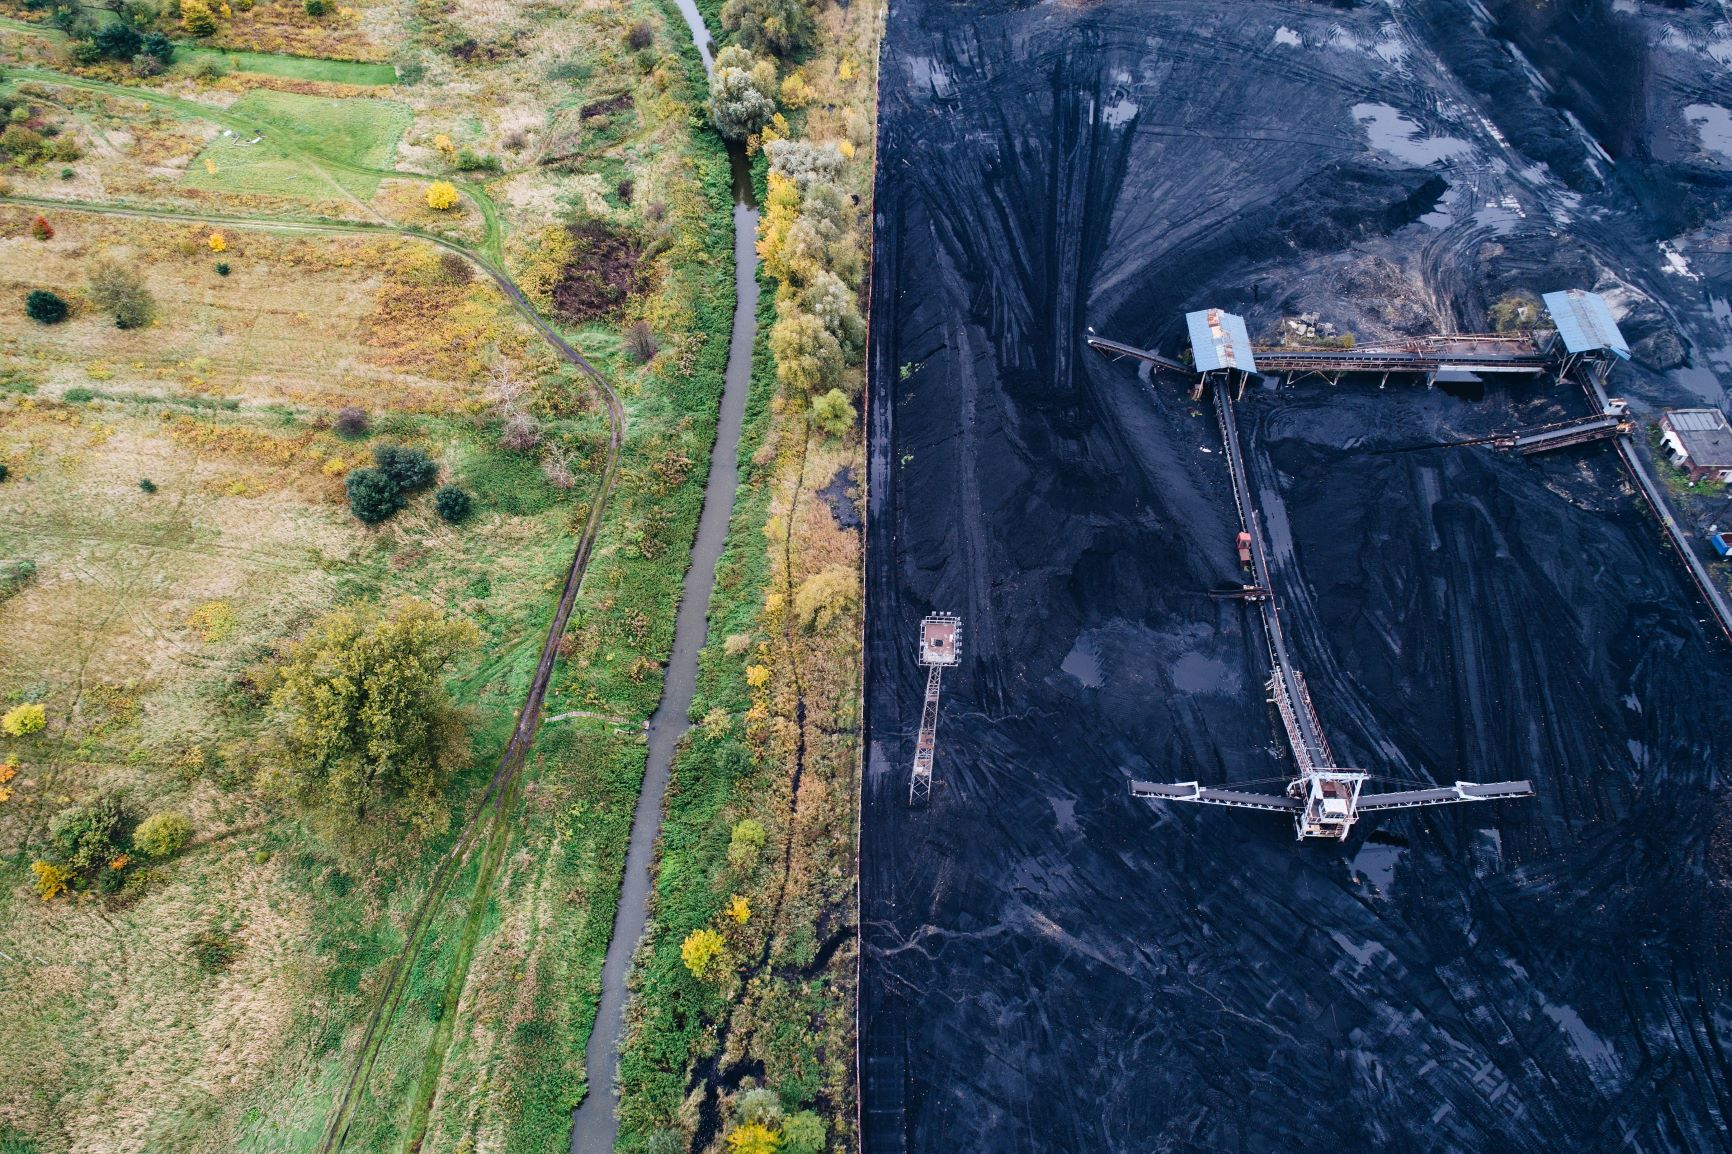 Poland's coal confrontation with the EU fuels talk of Polexit